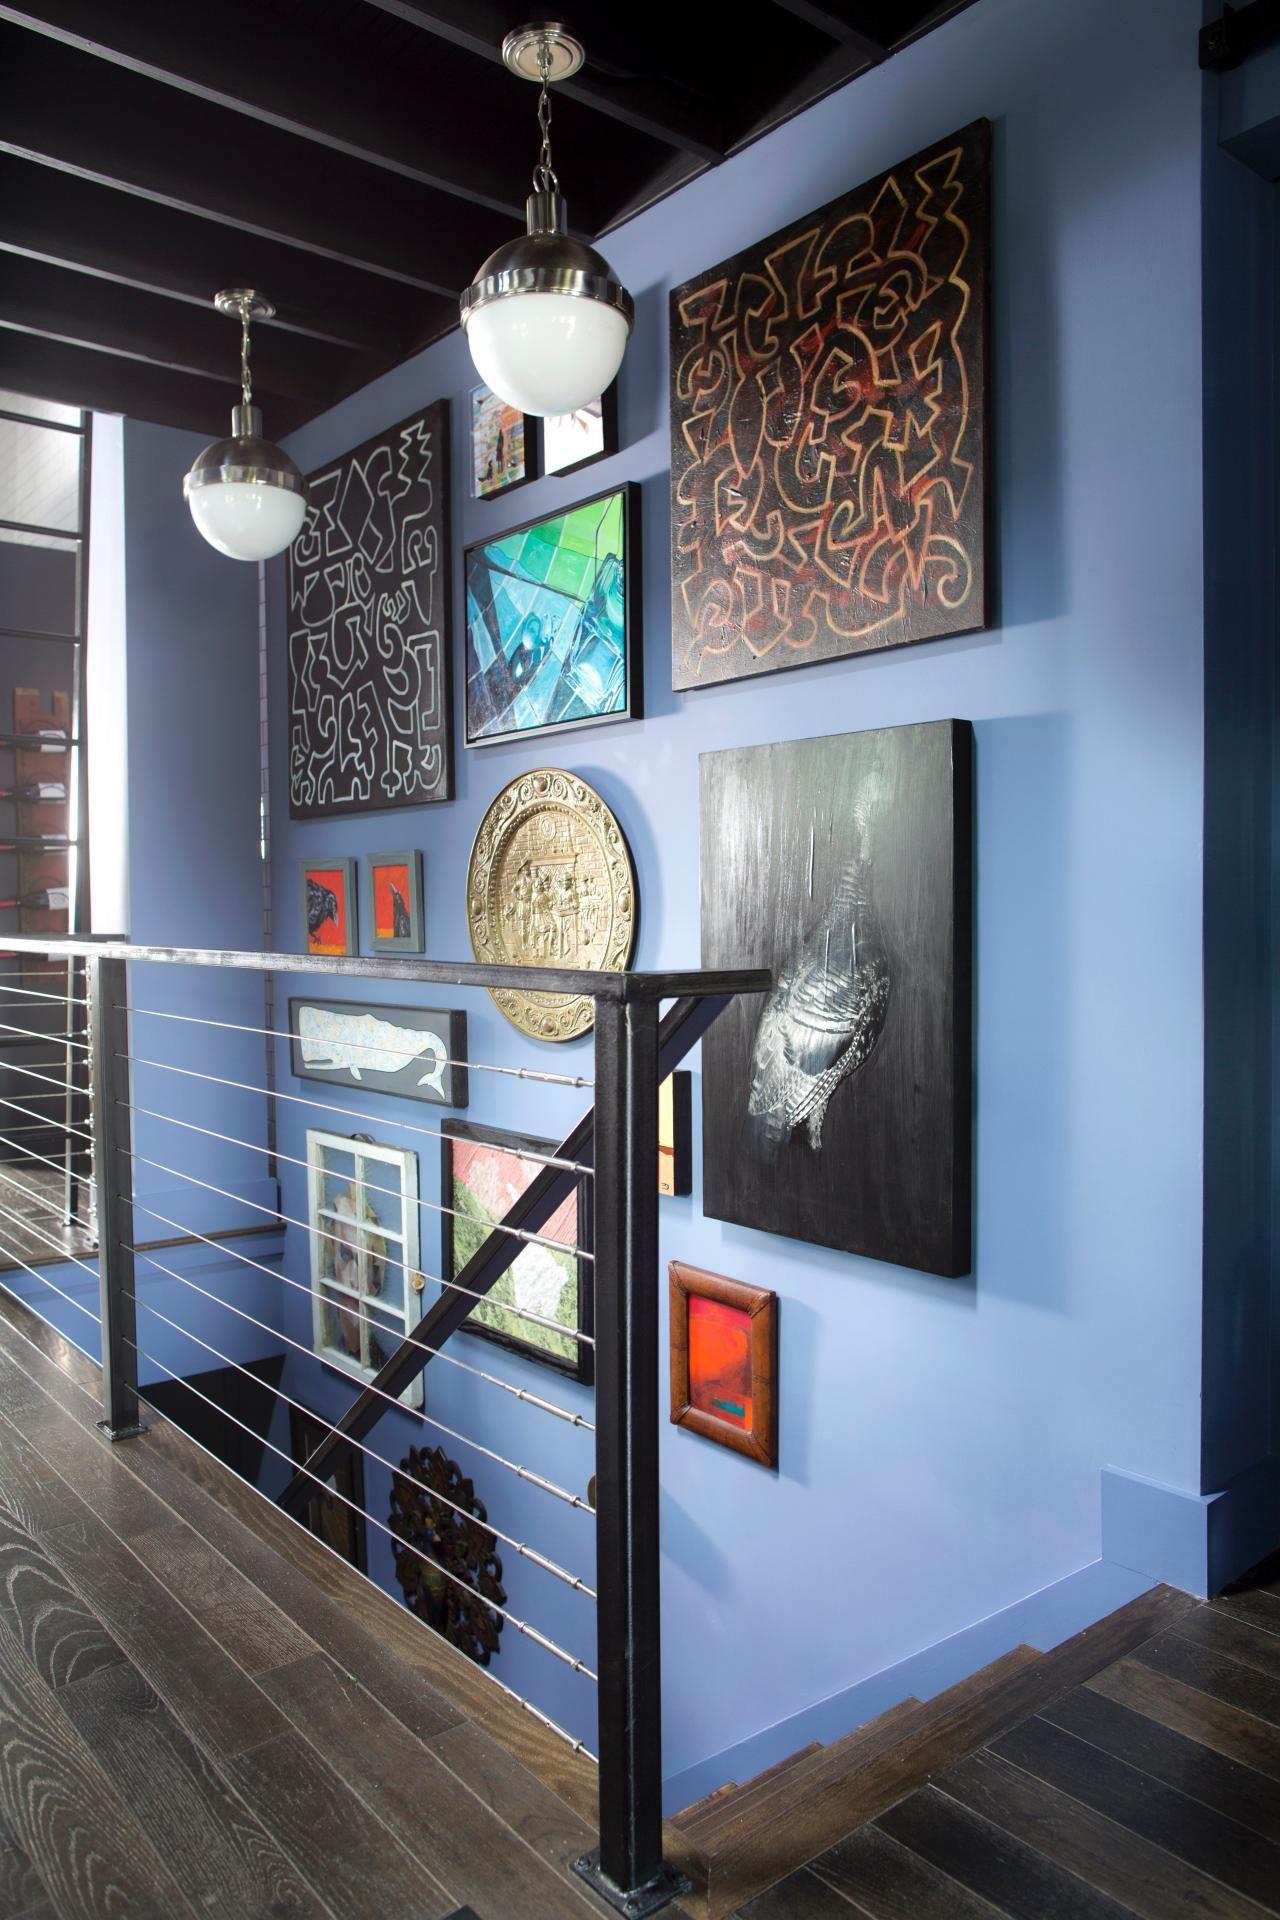 Dining Room Design Ideas From Hgtv Urban Oasis 2015 >>